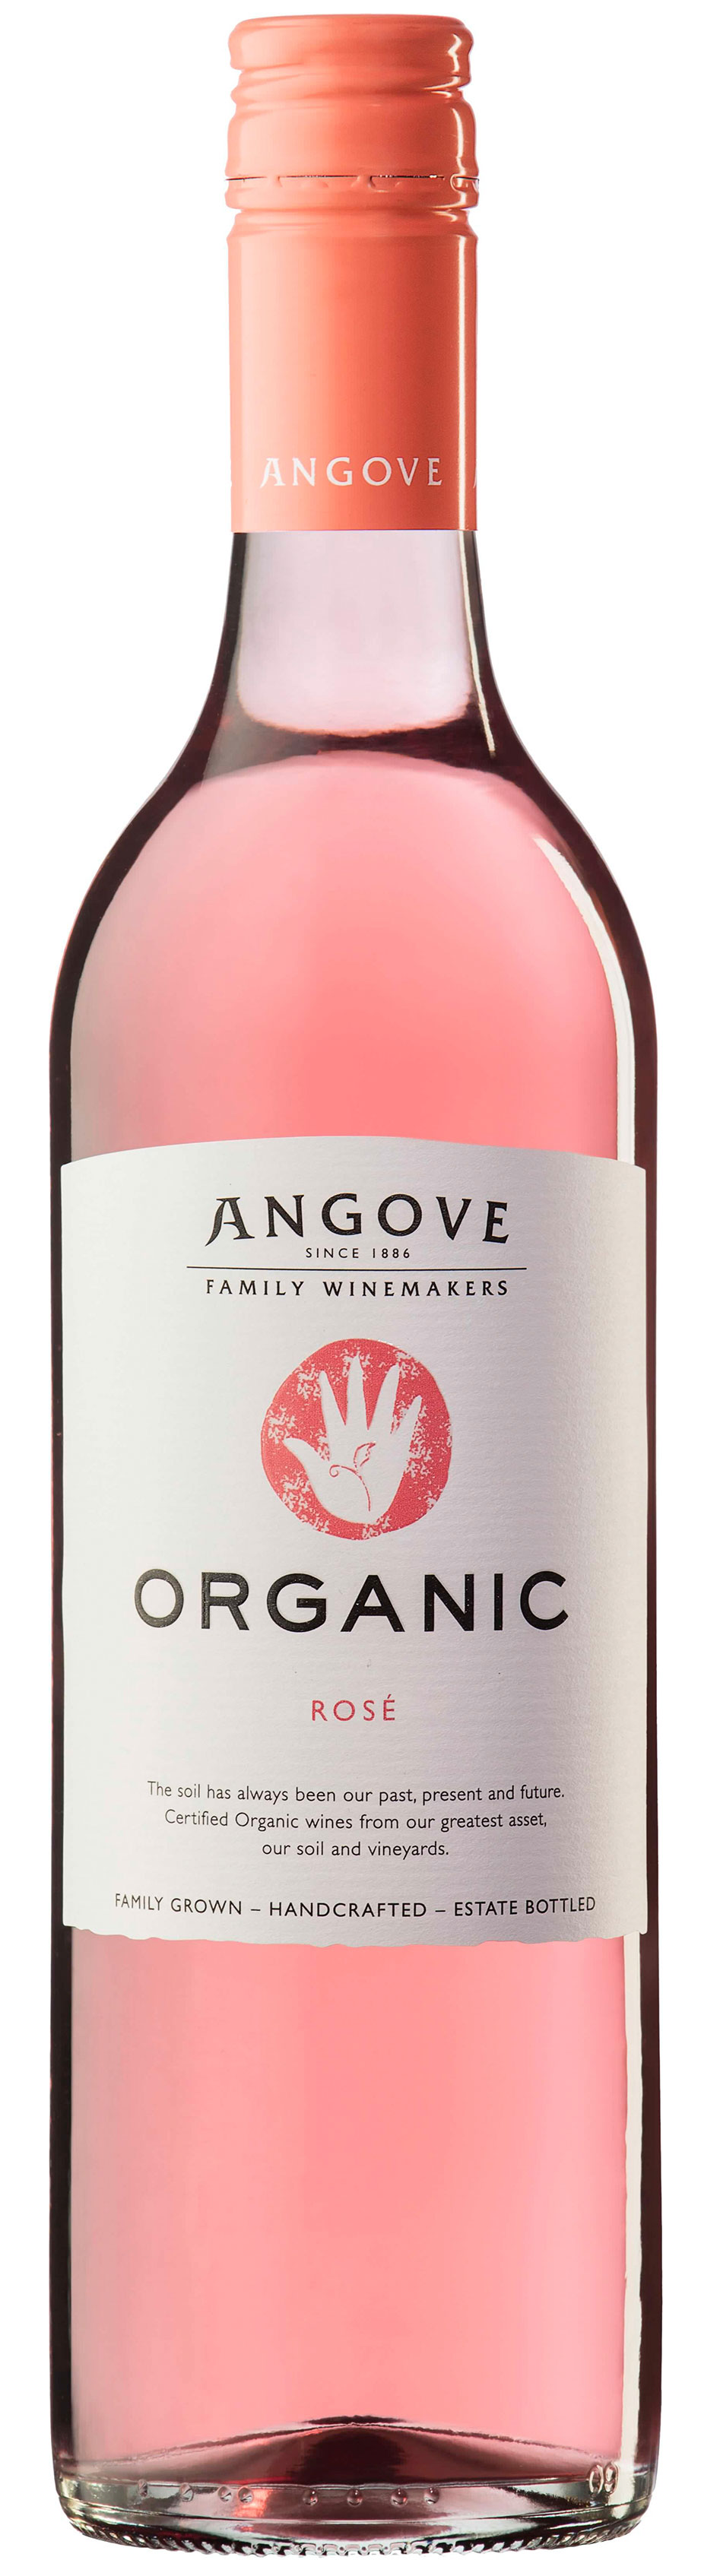 https://vinocorpperu.com/images/vinos/angove/angove_organic_rose_2020.jpg